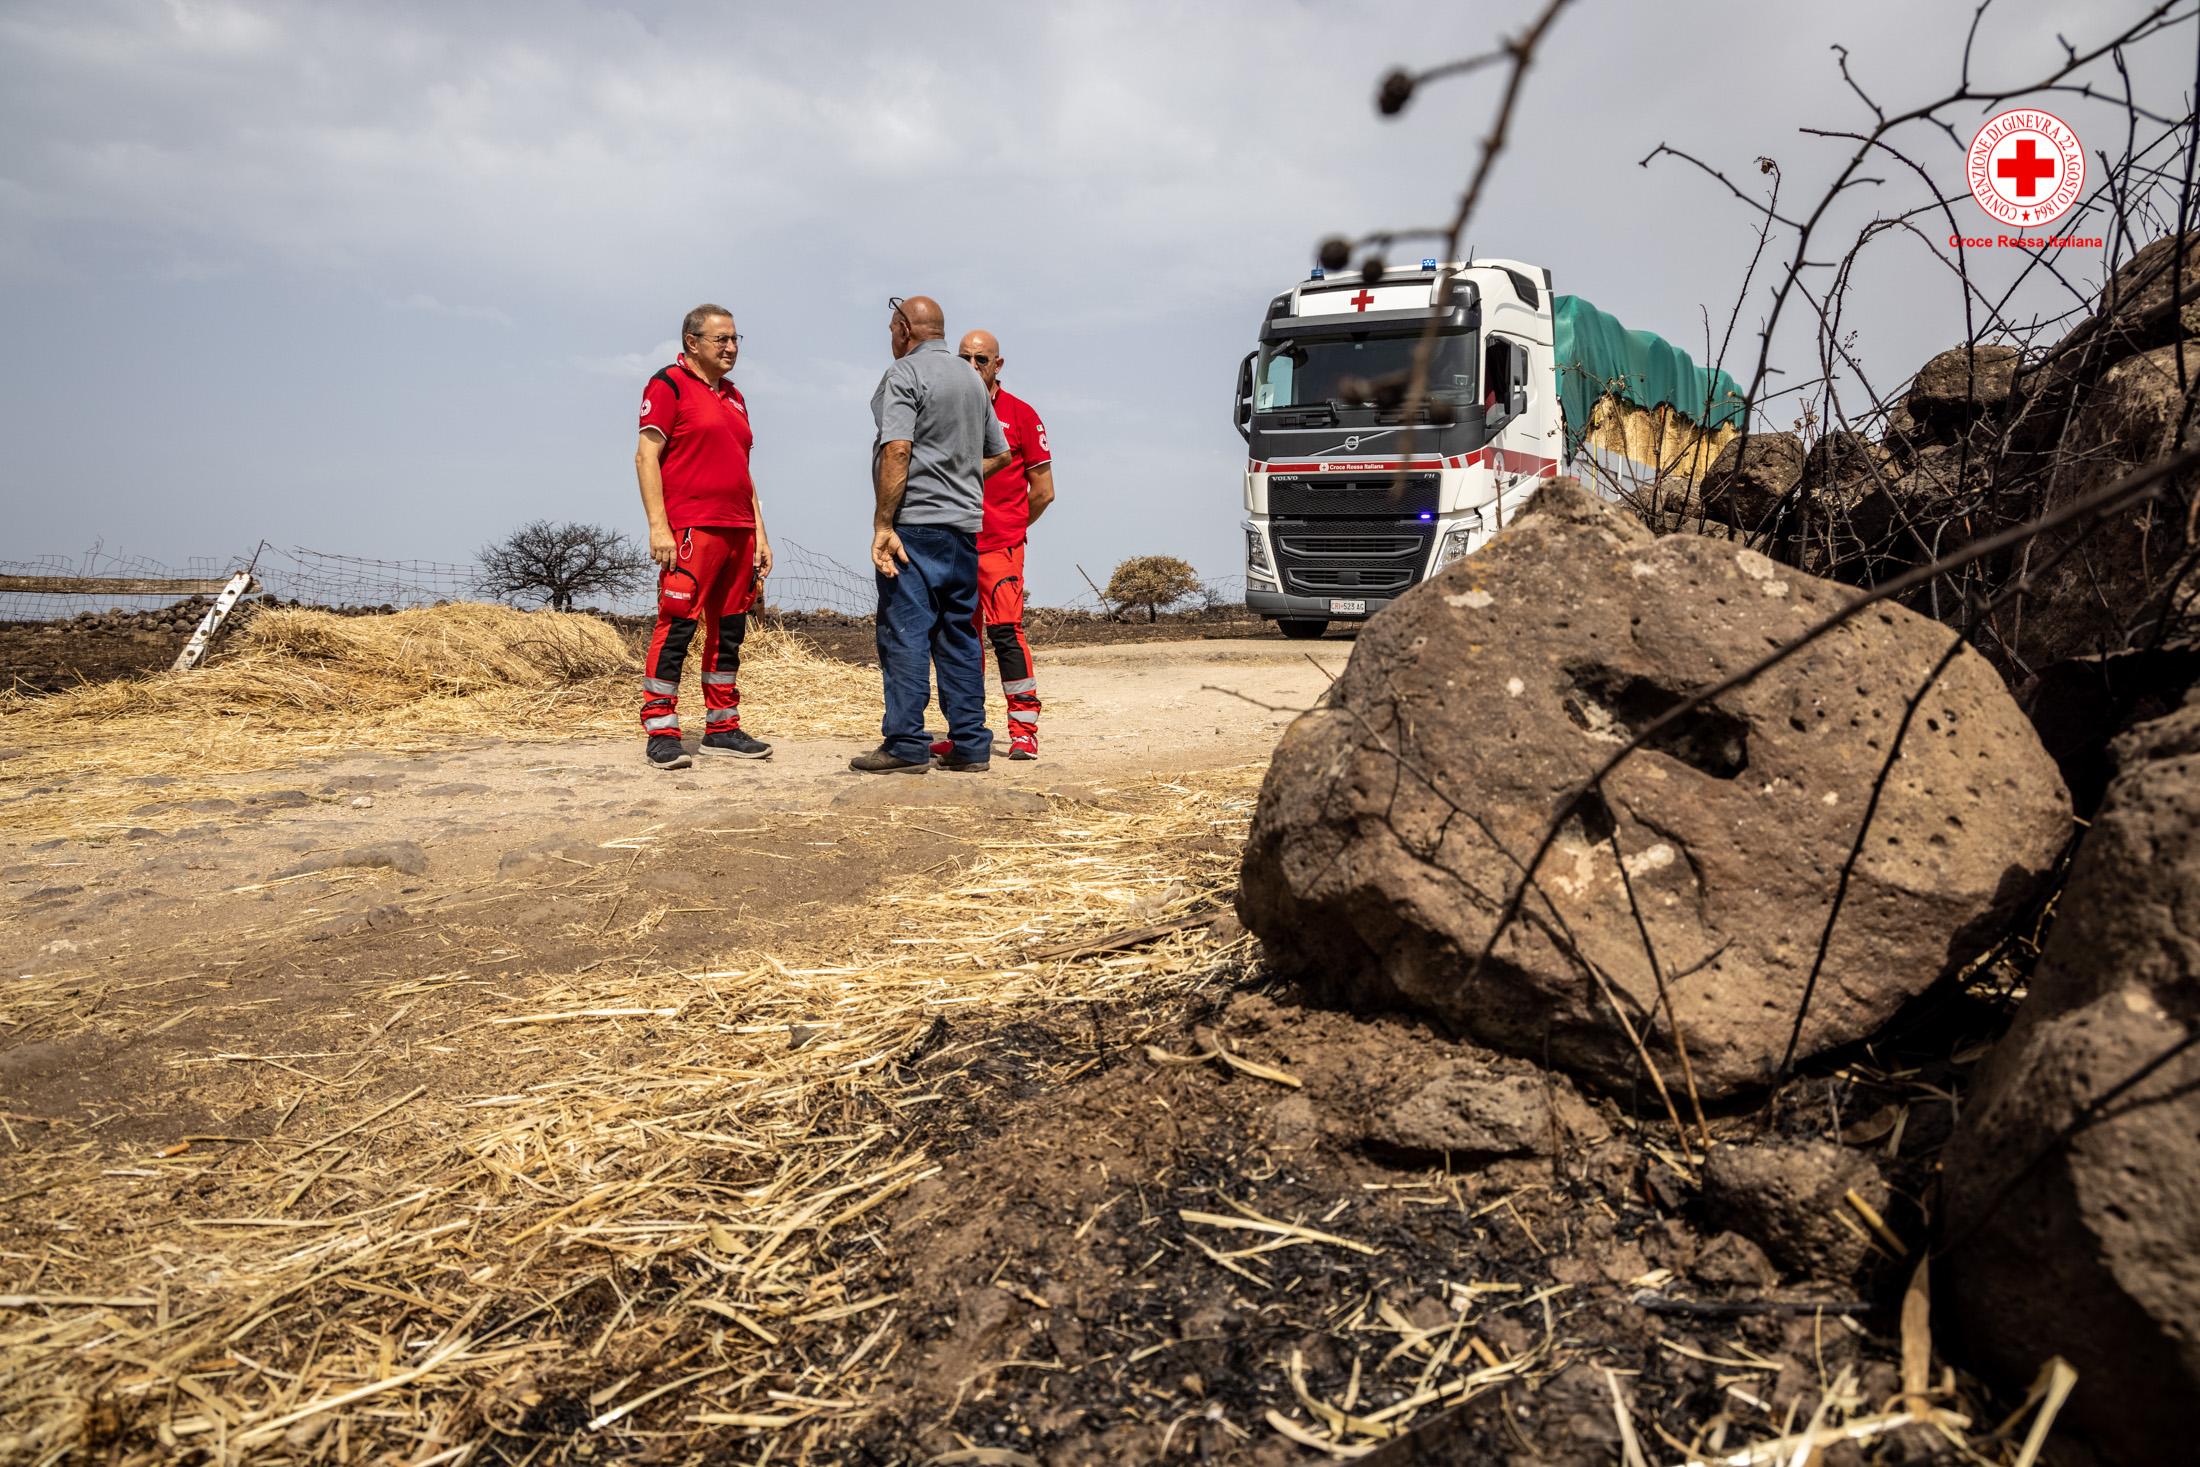 Croce-Rossa-Sardegna-Incendi-Aiuti-Allevatori-23